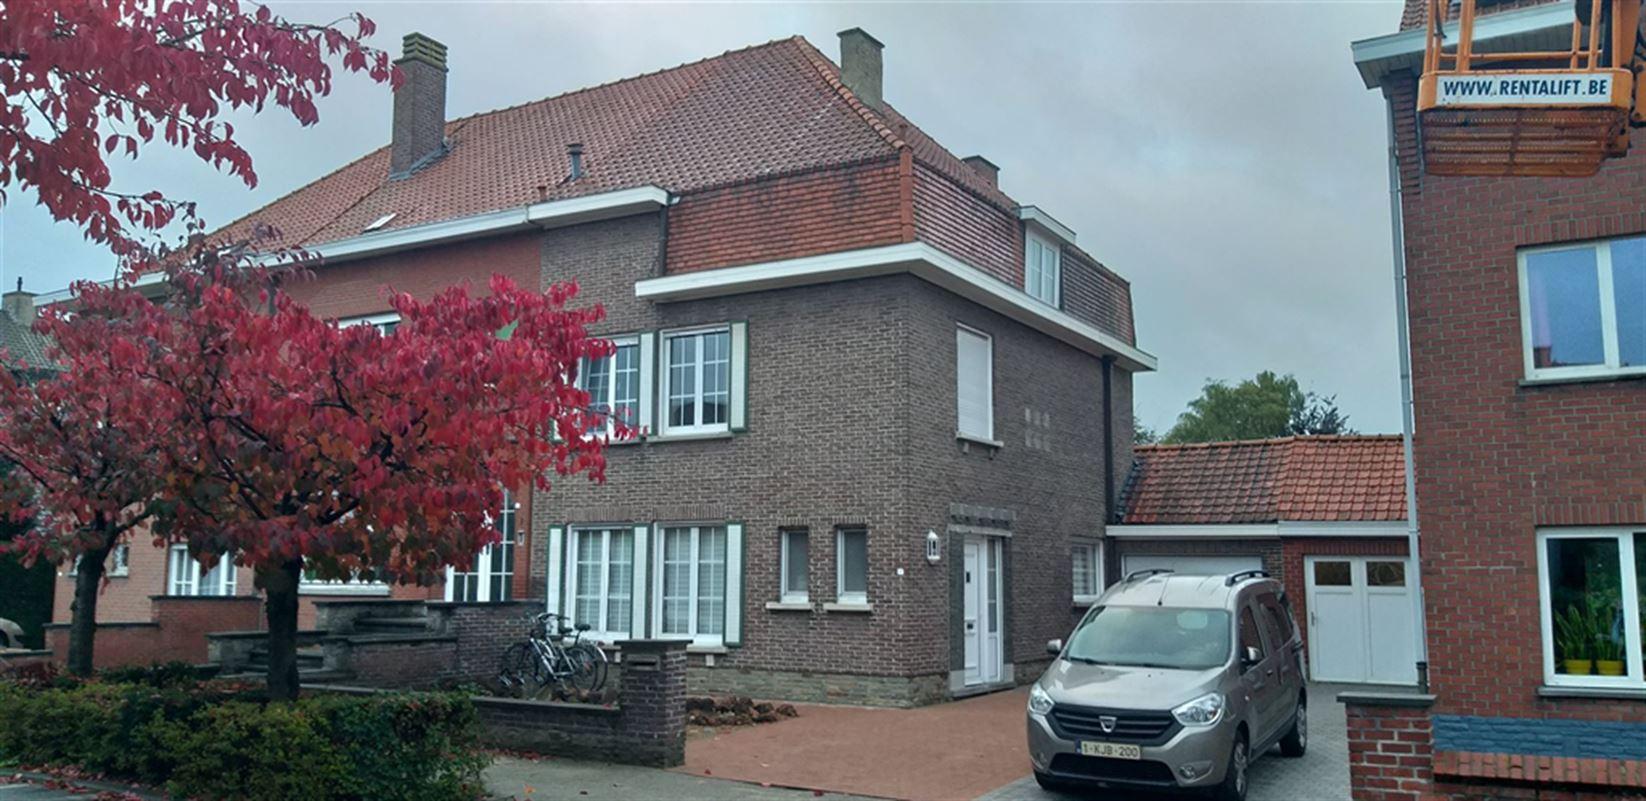 Foto 1 : Huis te 8500 KORTRIJK (België) - Prijs € 795